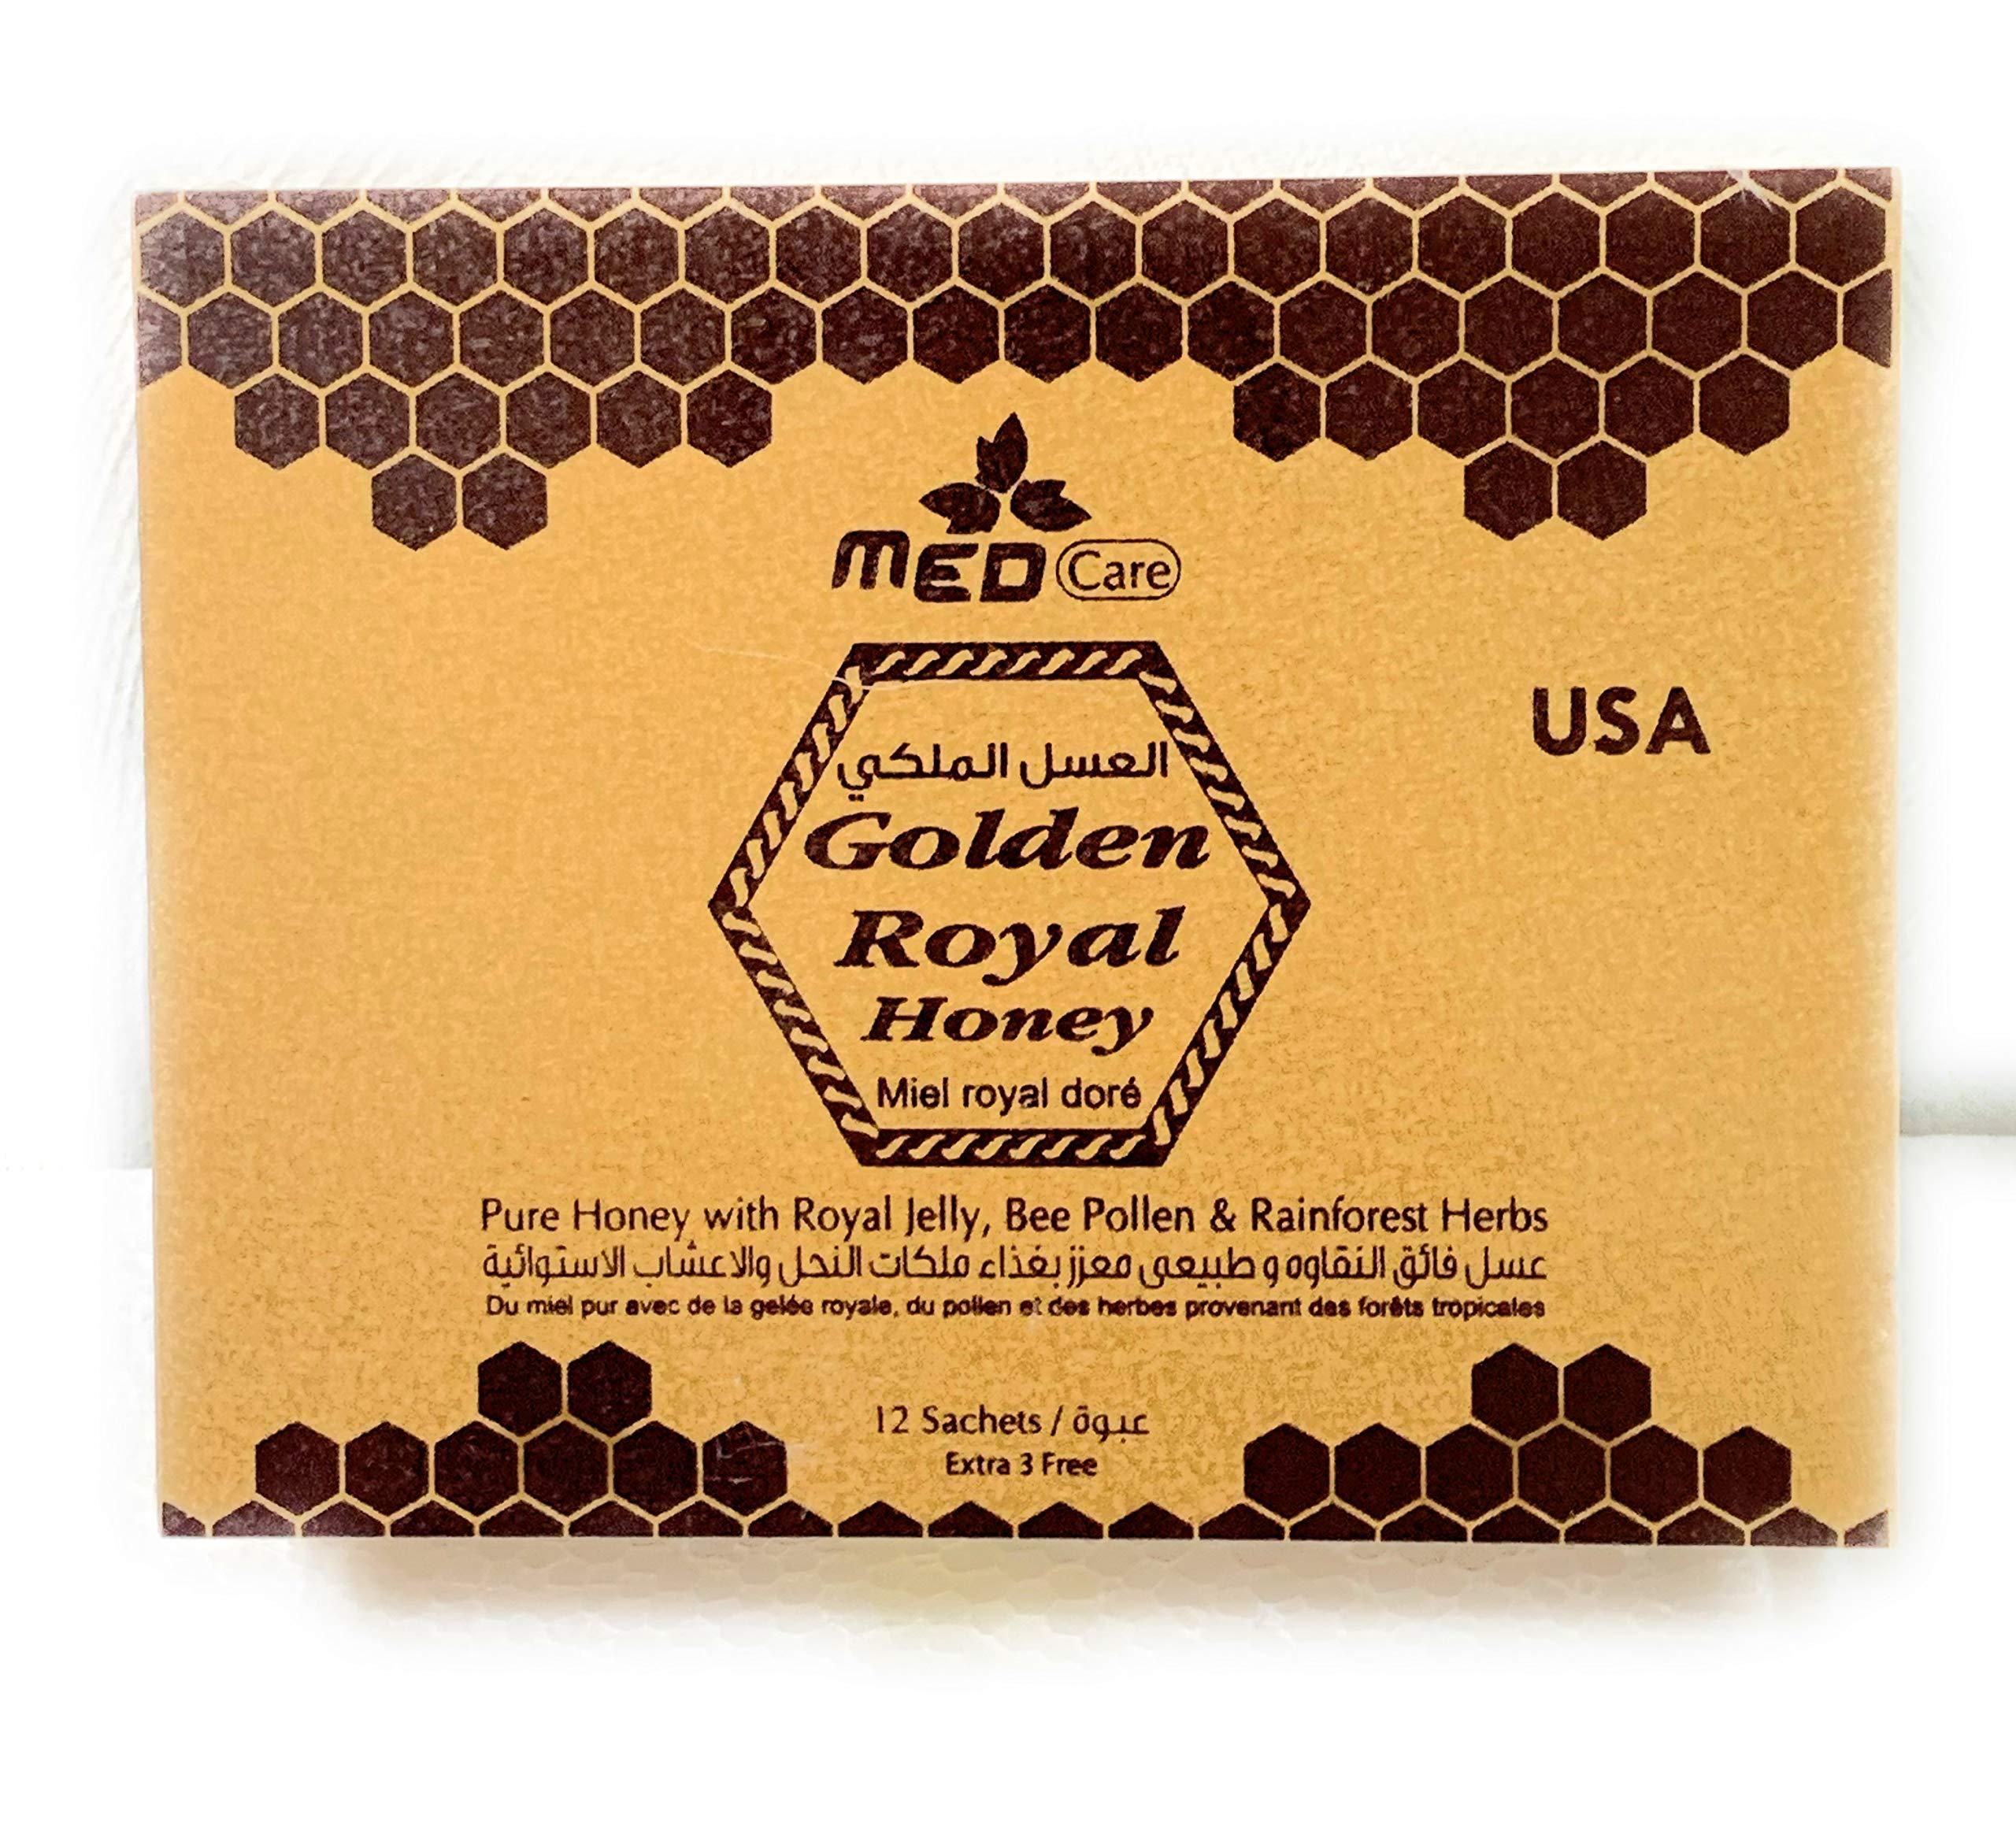 Golden Royal Honey for him 20g - 12 Satchets a Box